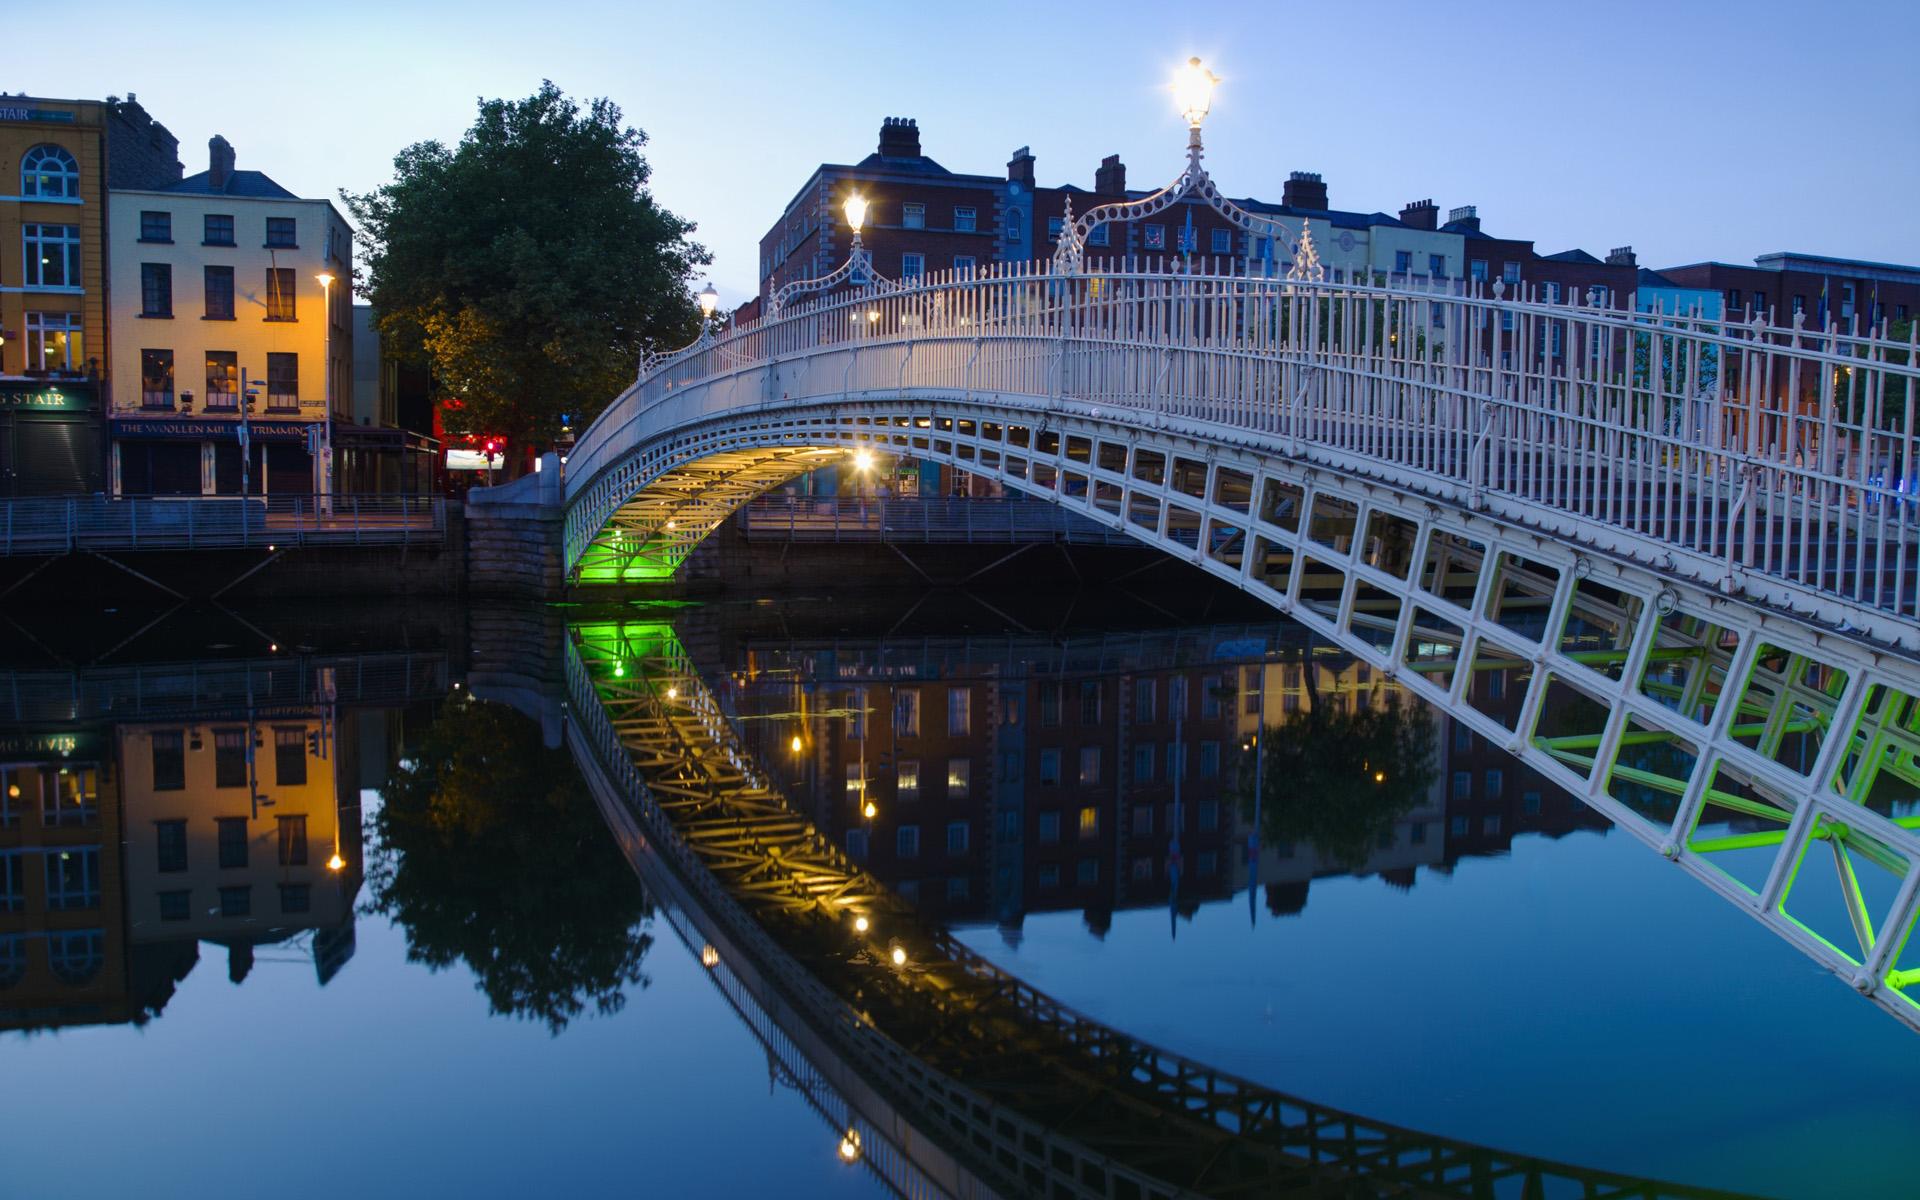 and River Liffey at night Dublin Ireland Wallpaper Wallpapers 1920x1200